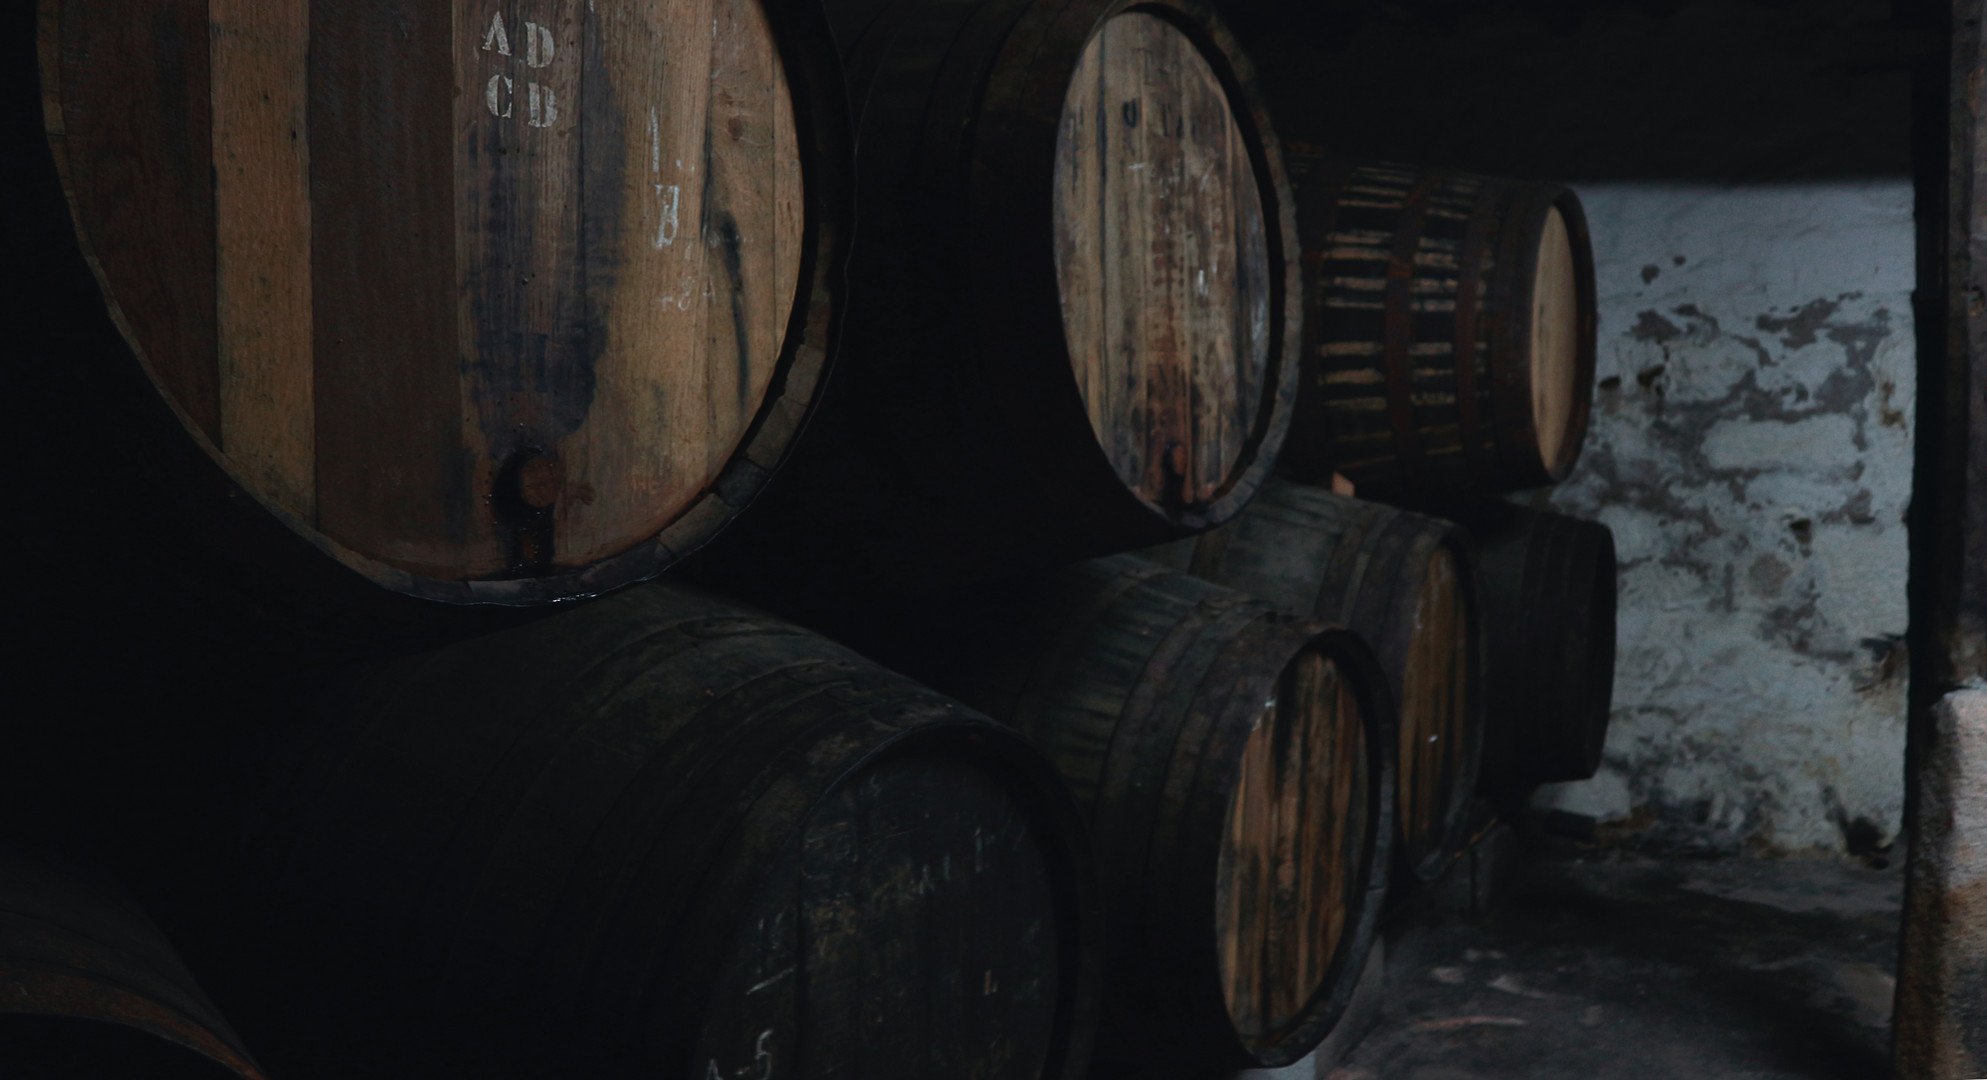 Quinta das Lamelas - Douro - Vindima - Harvest - barrel - barrica - pipa